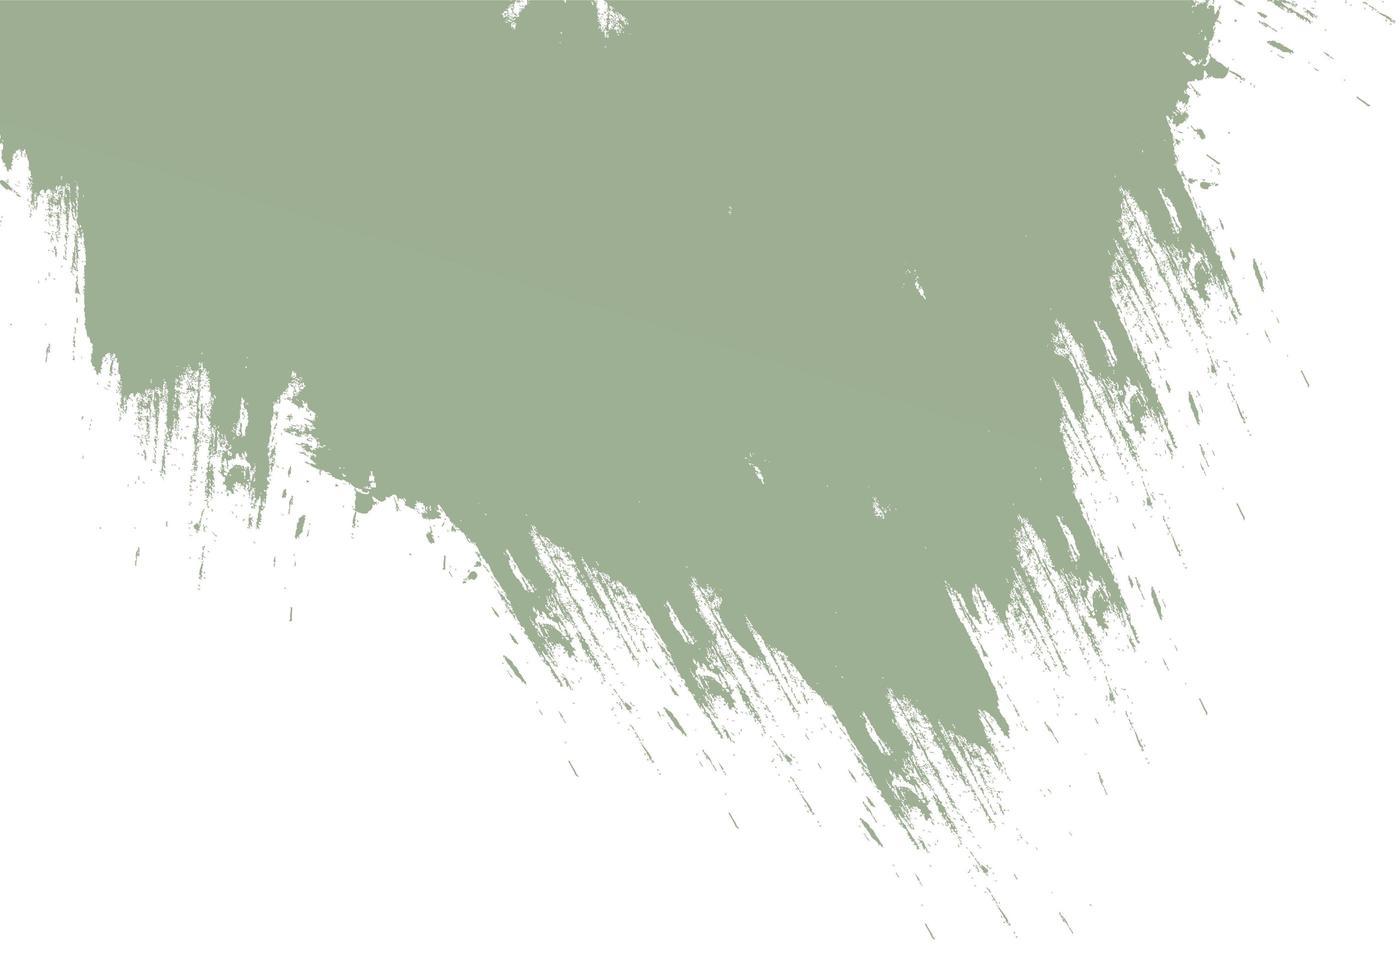 Modern Grey Grunge Upside Down Triangle Ink Stroke Texture vector